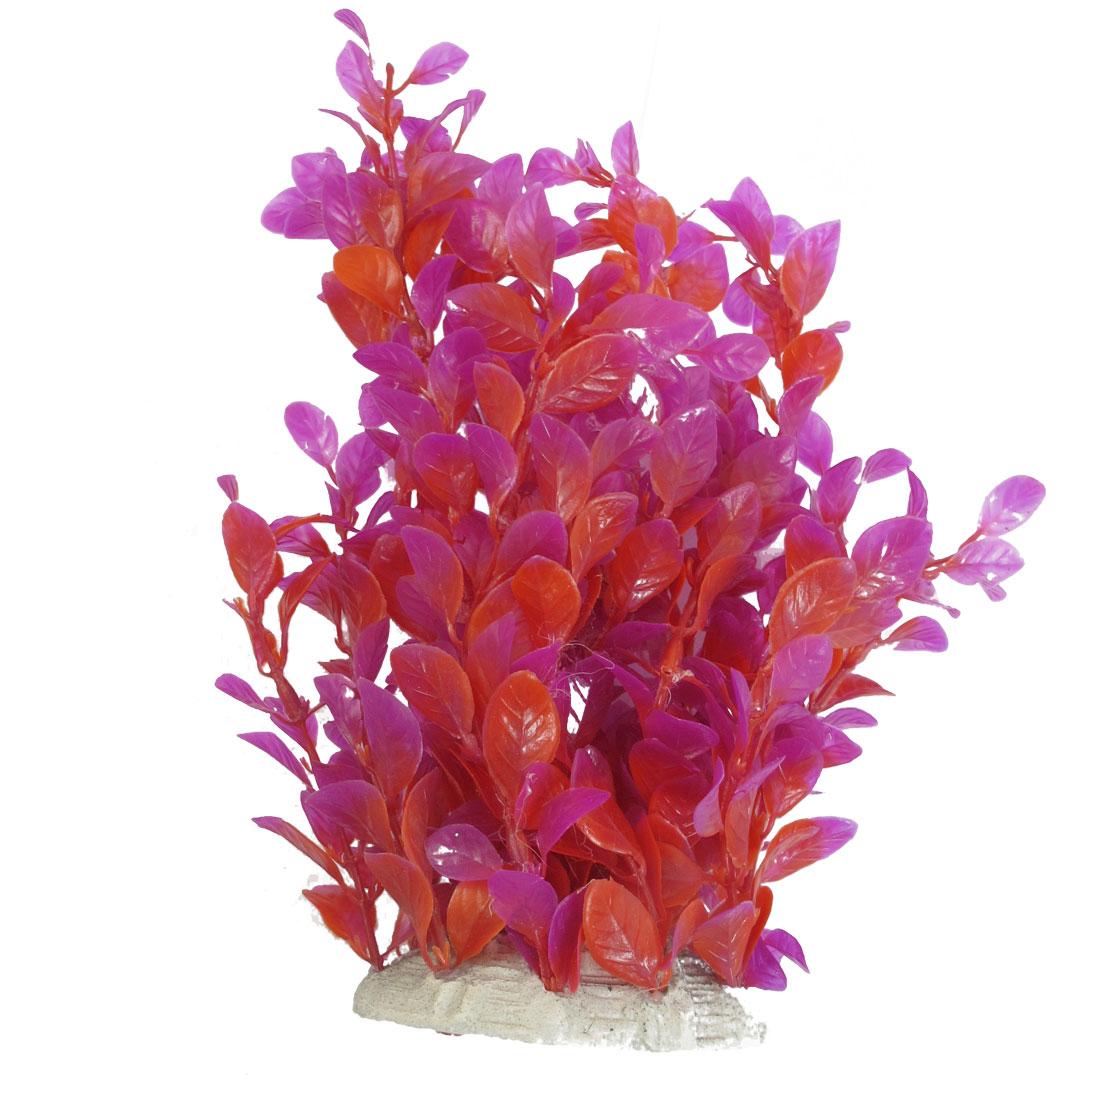 Hot Pink Red Artificial Emulational Aquascaping Grasses for Aquarium